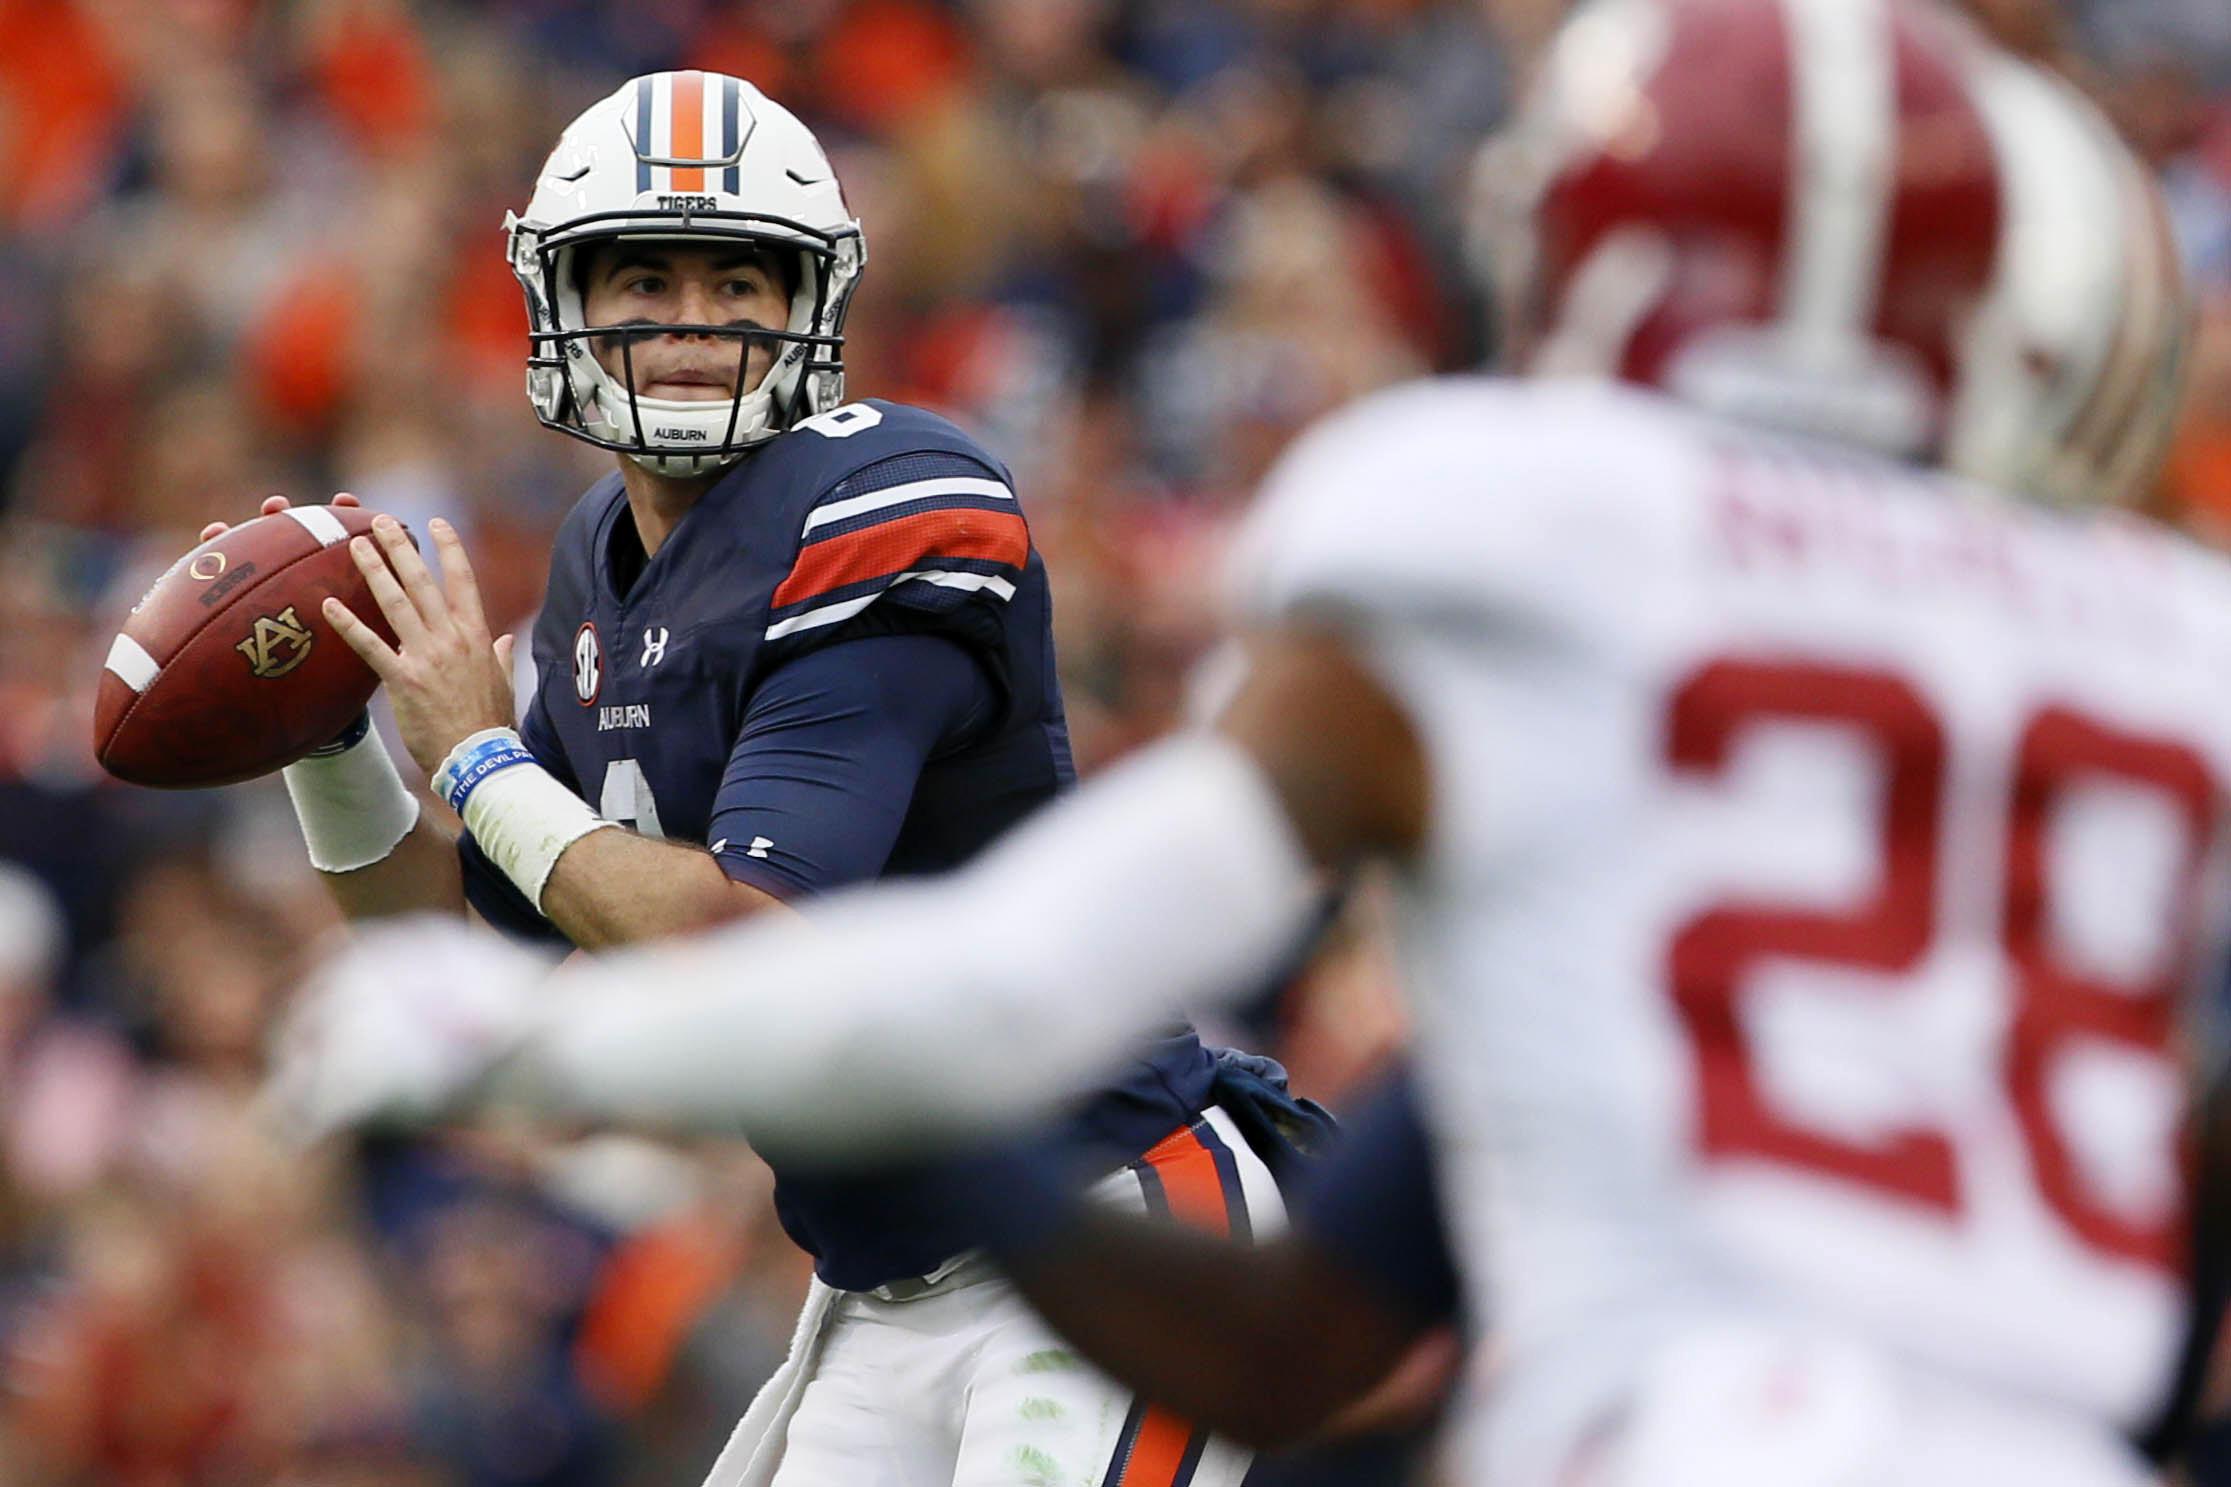 Auburn Alabama Football Game Gives Top Ranked Crimson Tide First